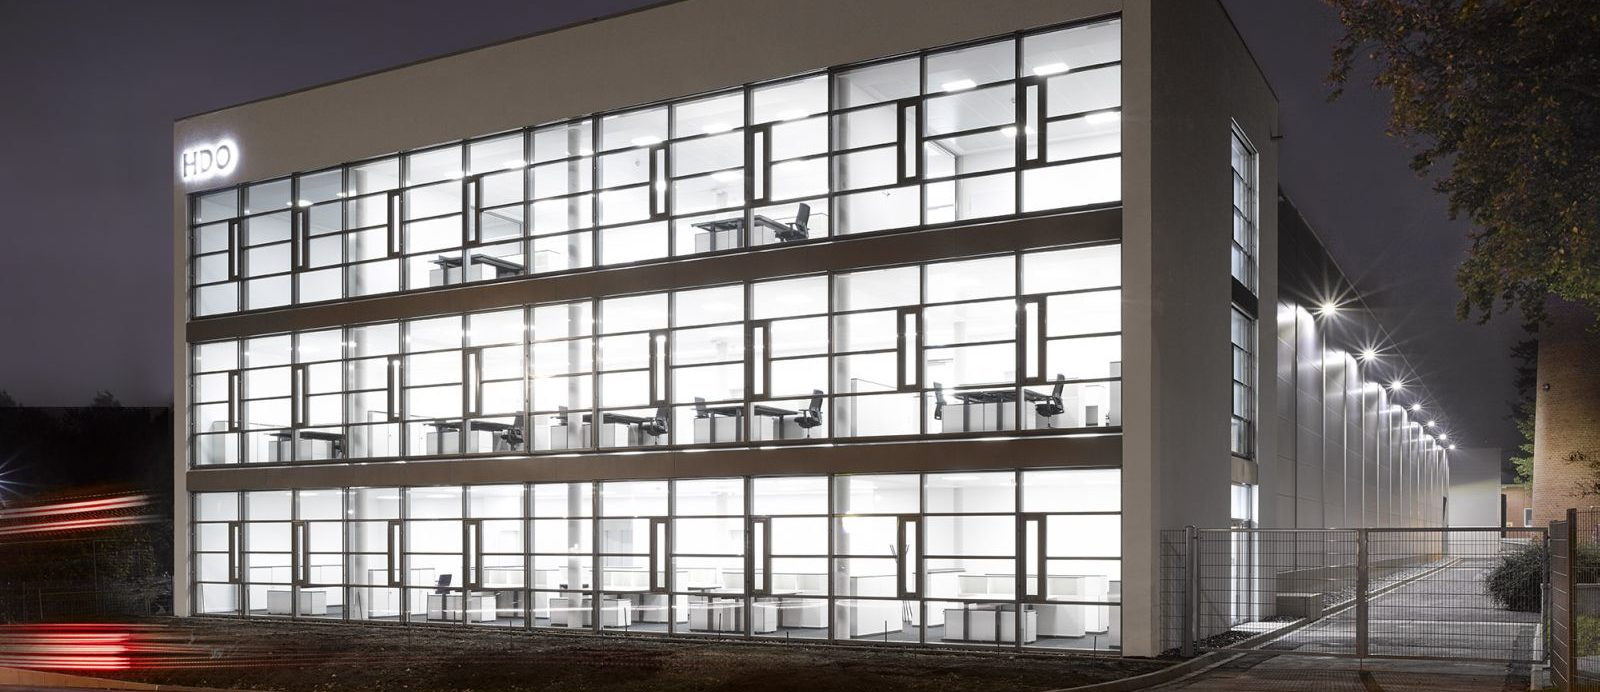 Neues HDO Bürogebäude am Standort Paderborn